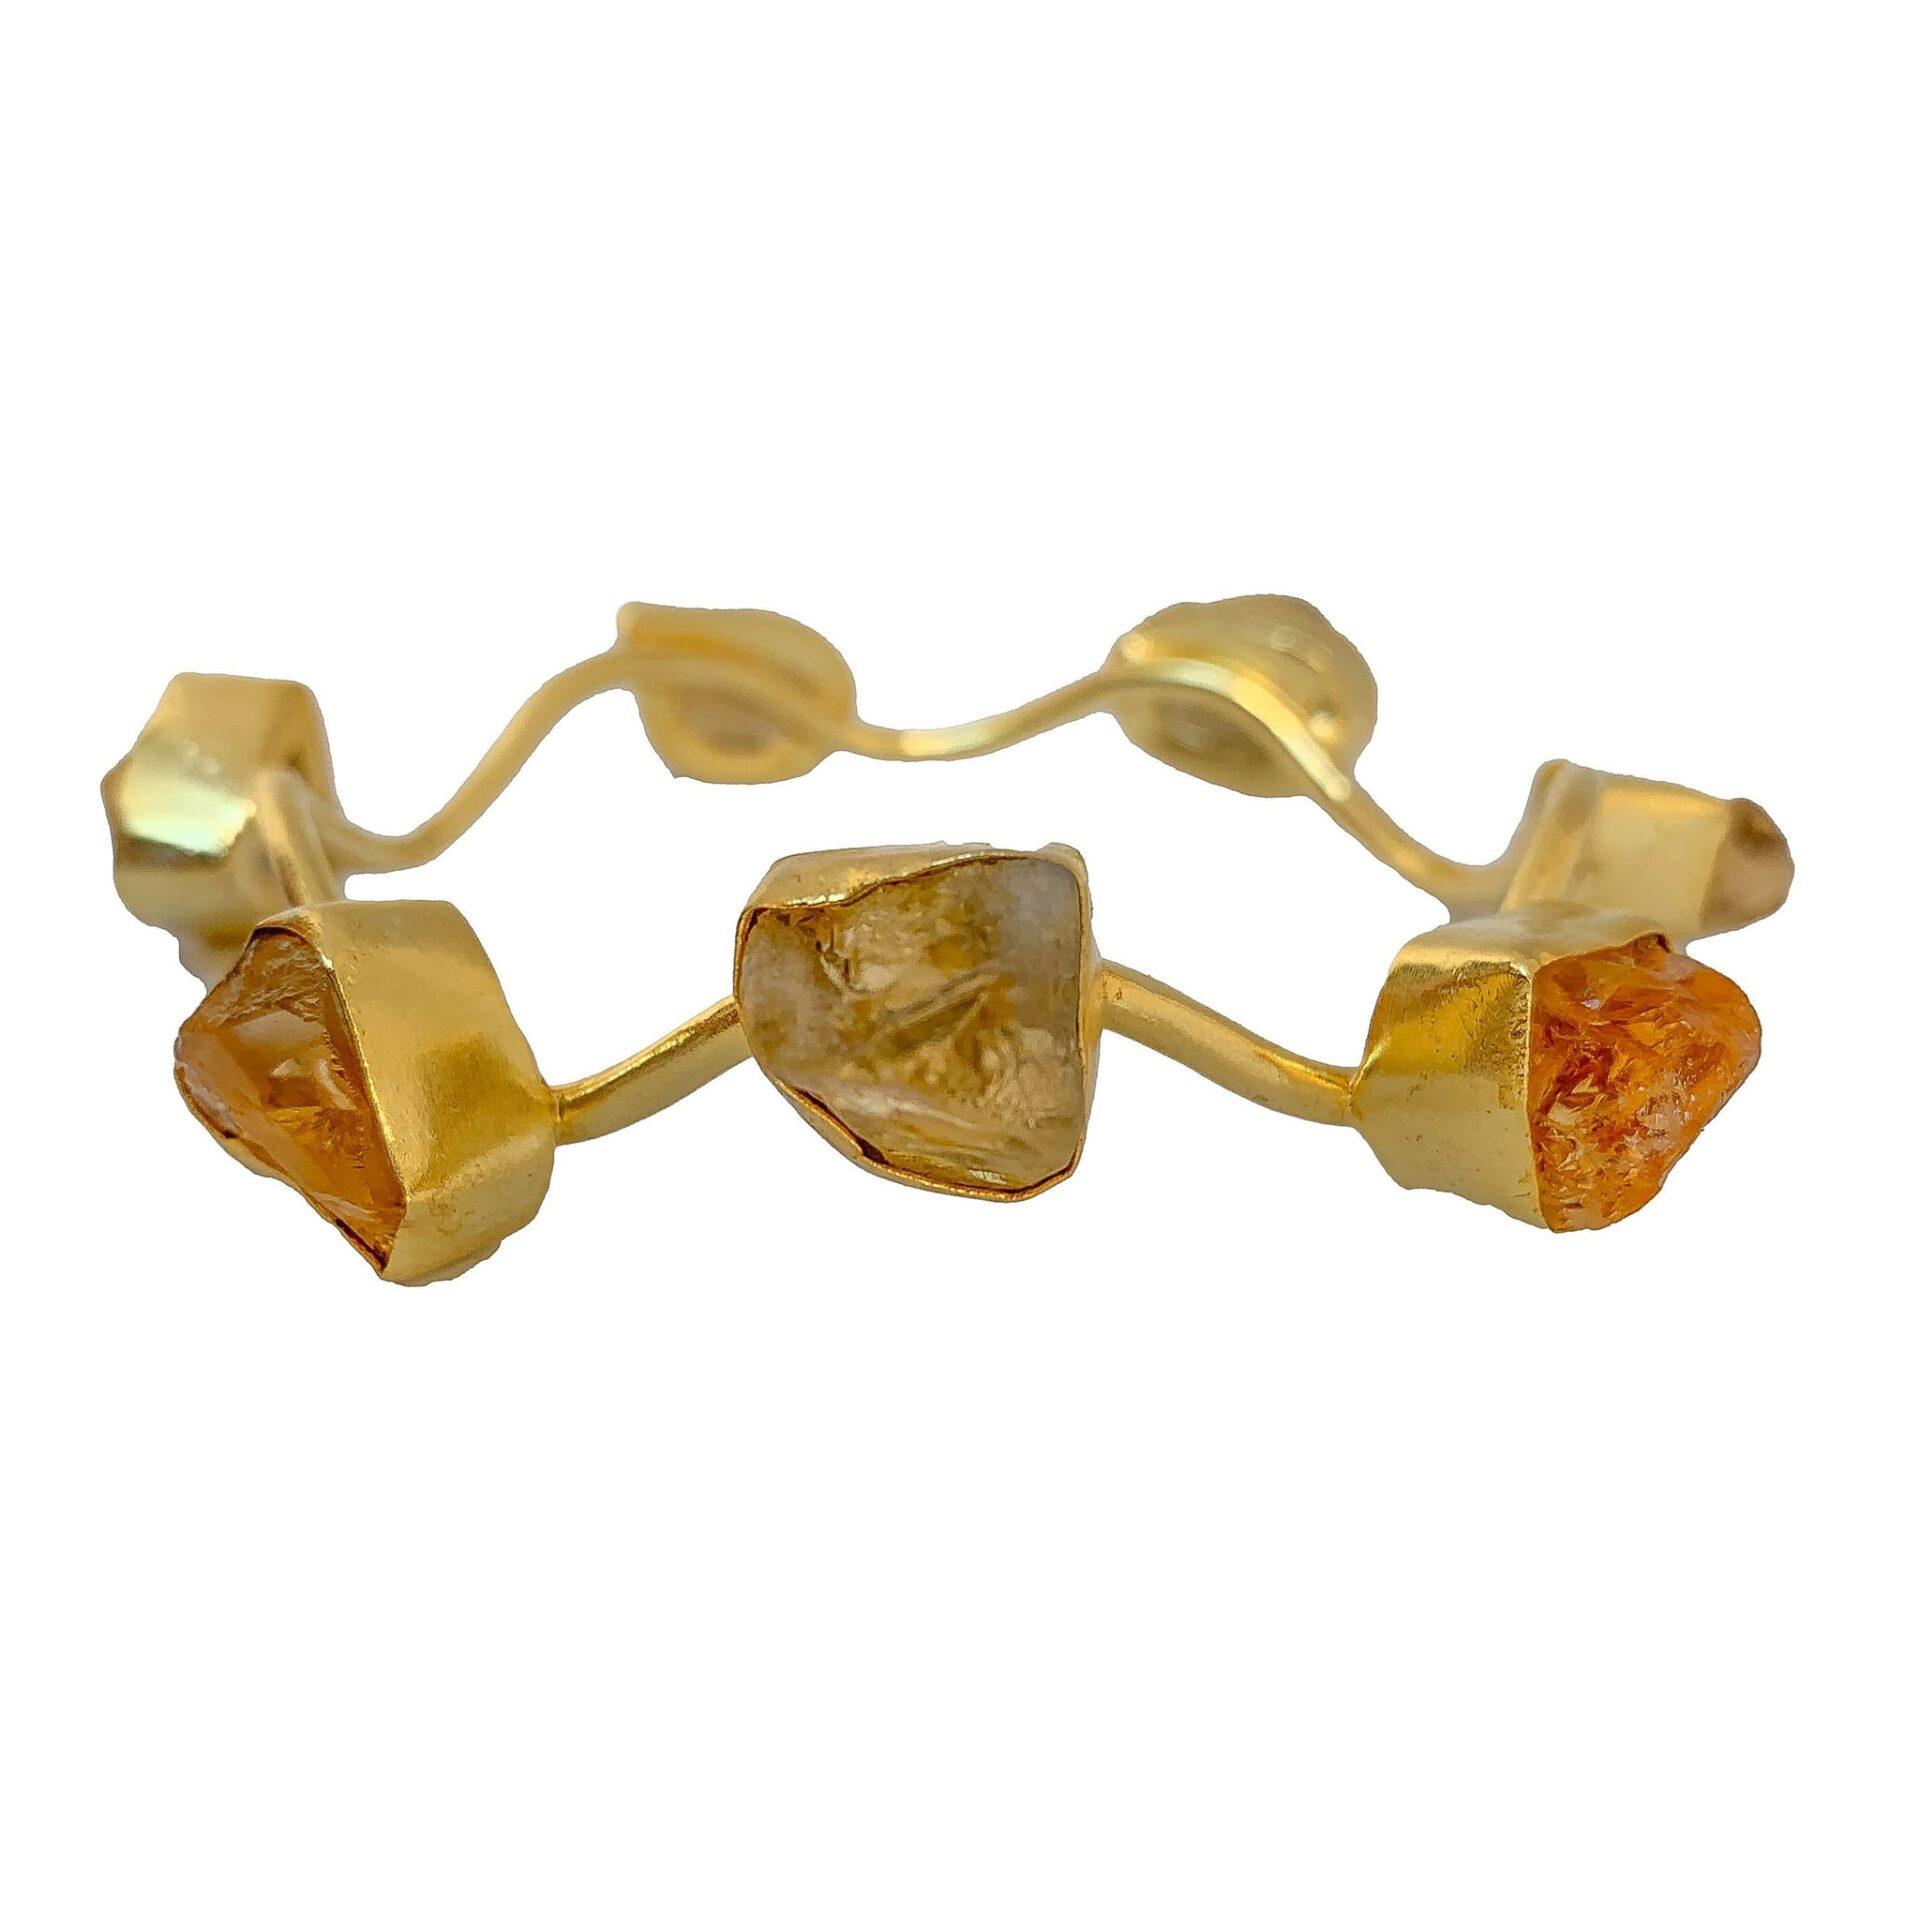 Tanya litkovska Women's Gold Carousel Bangle Bracelets